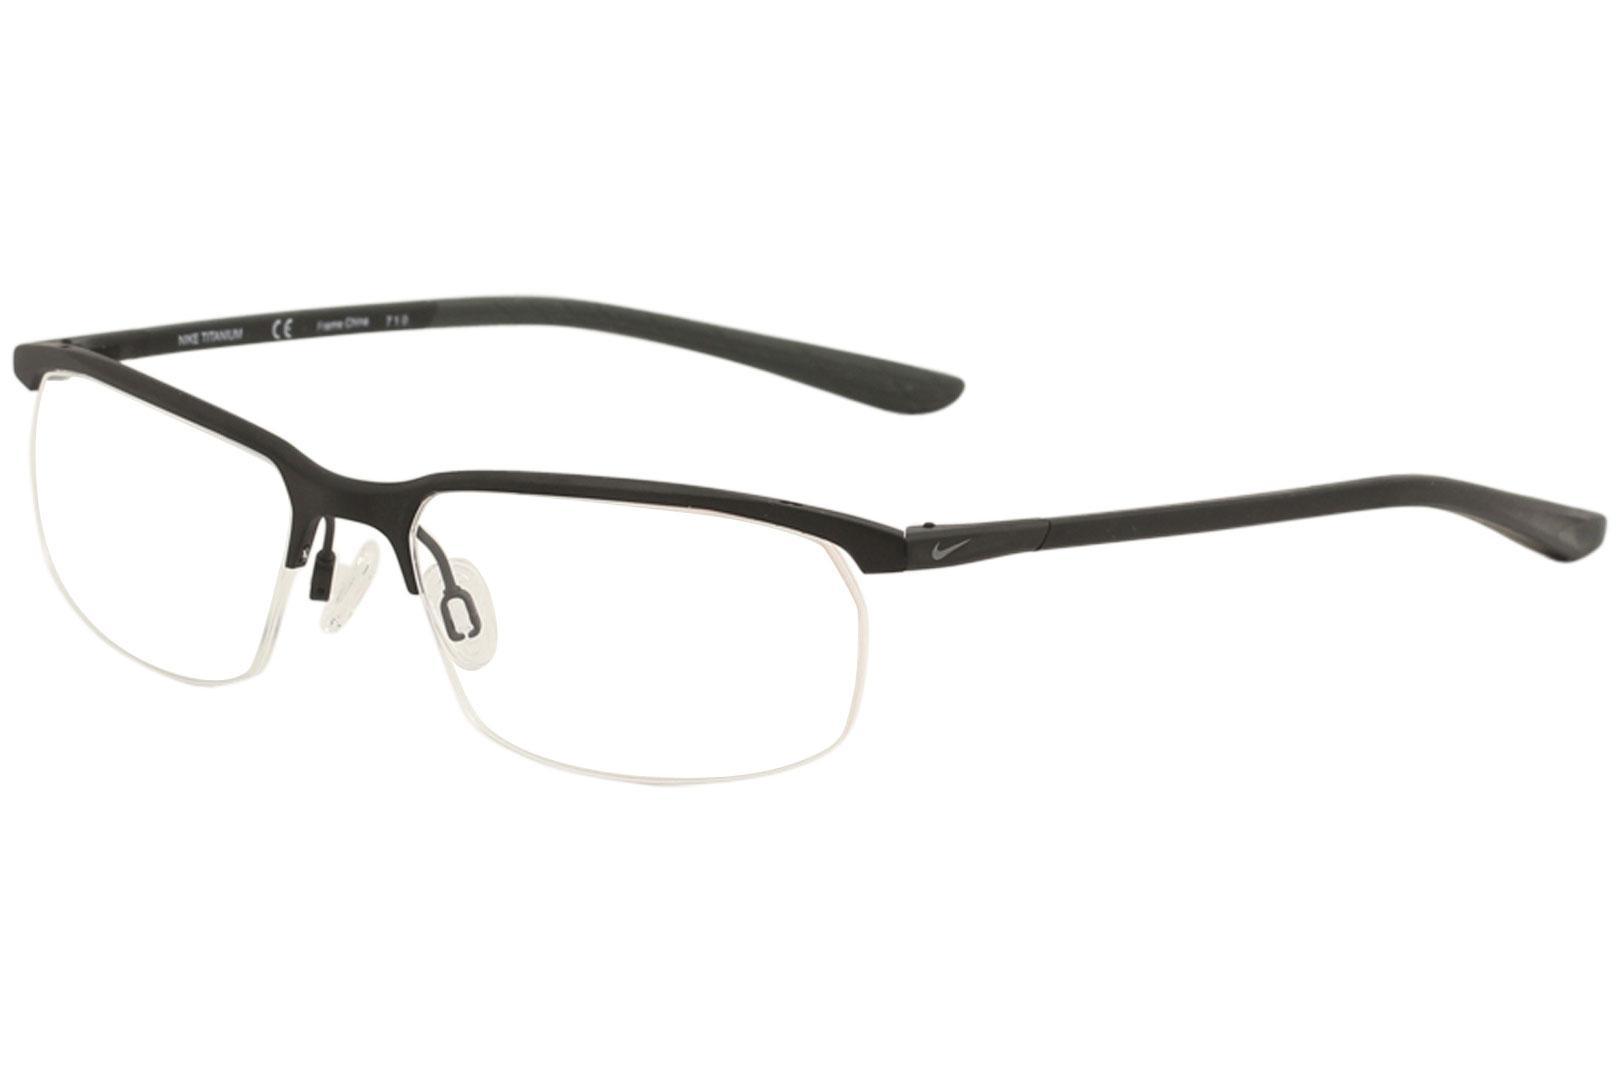 31266c65f9e Nike Men s Eyeglasses 6070 Half Rim Titanium Optical Frame